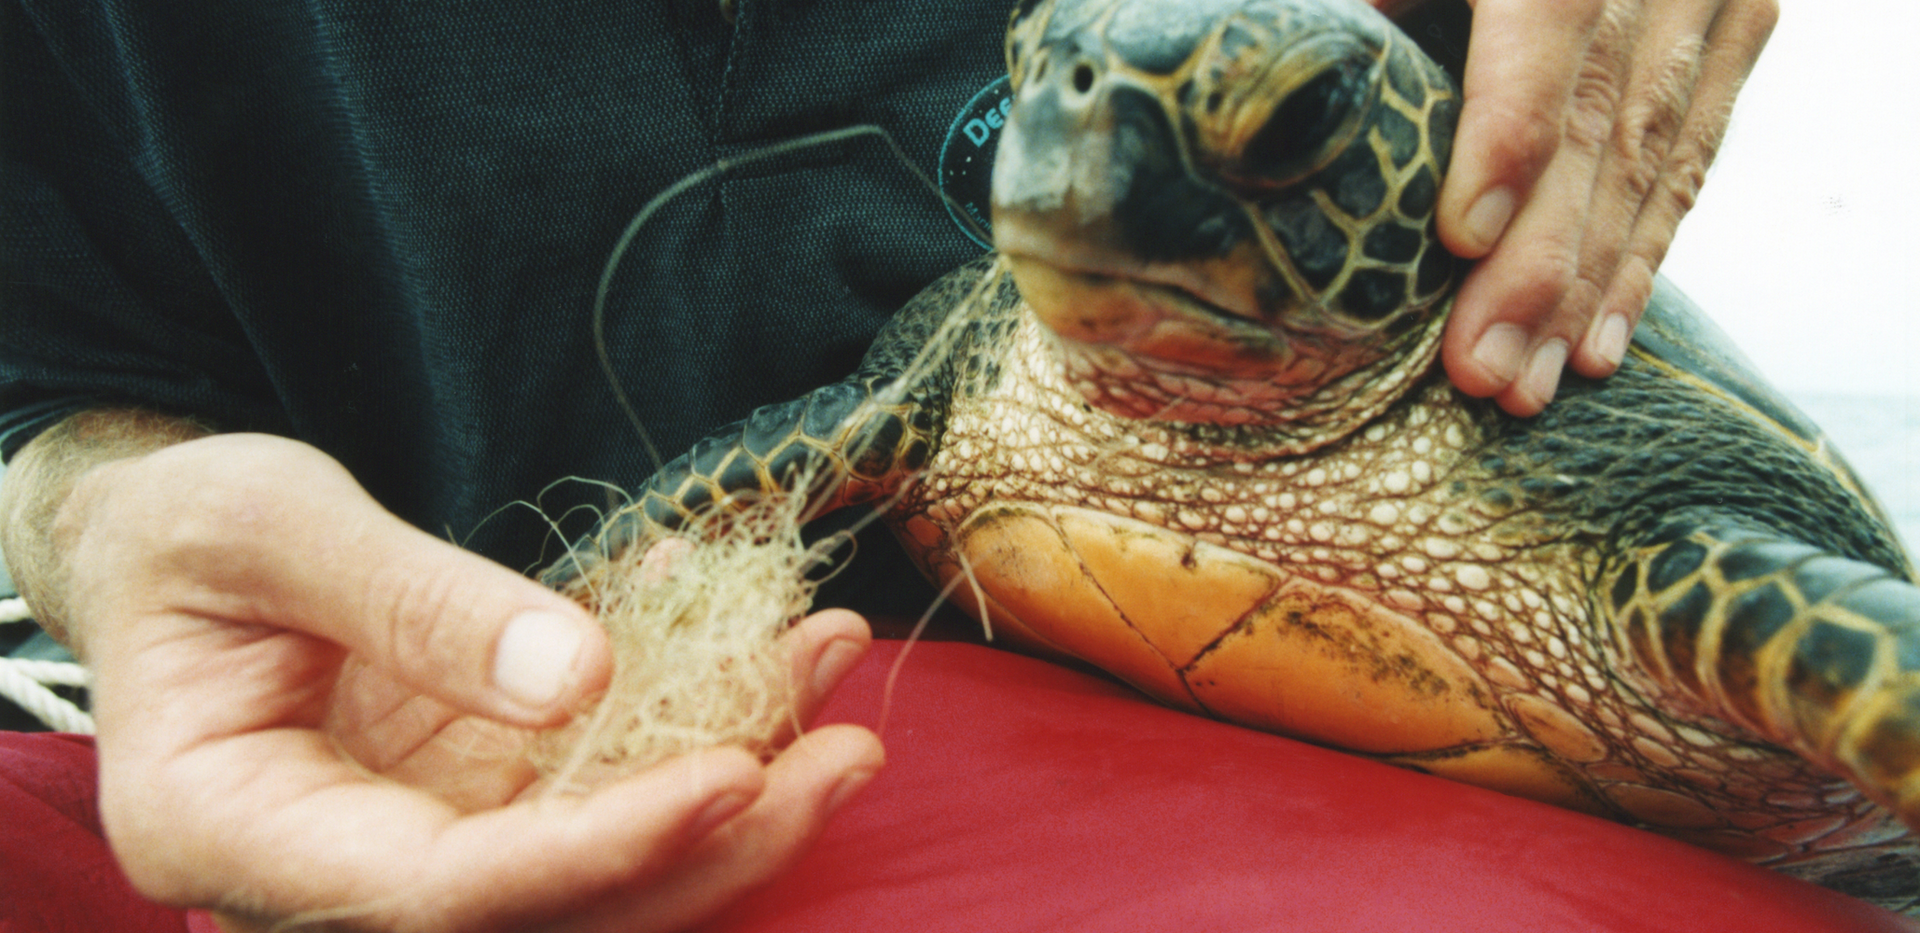 Ken rescuing Turtles in Hawaii